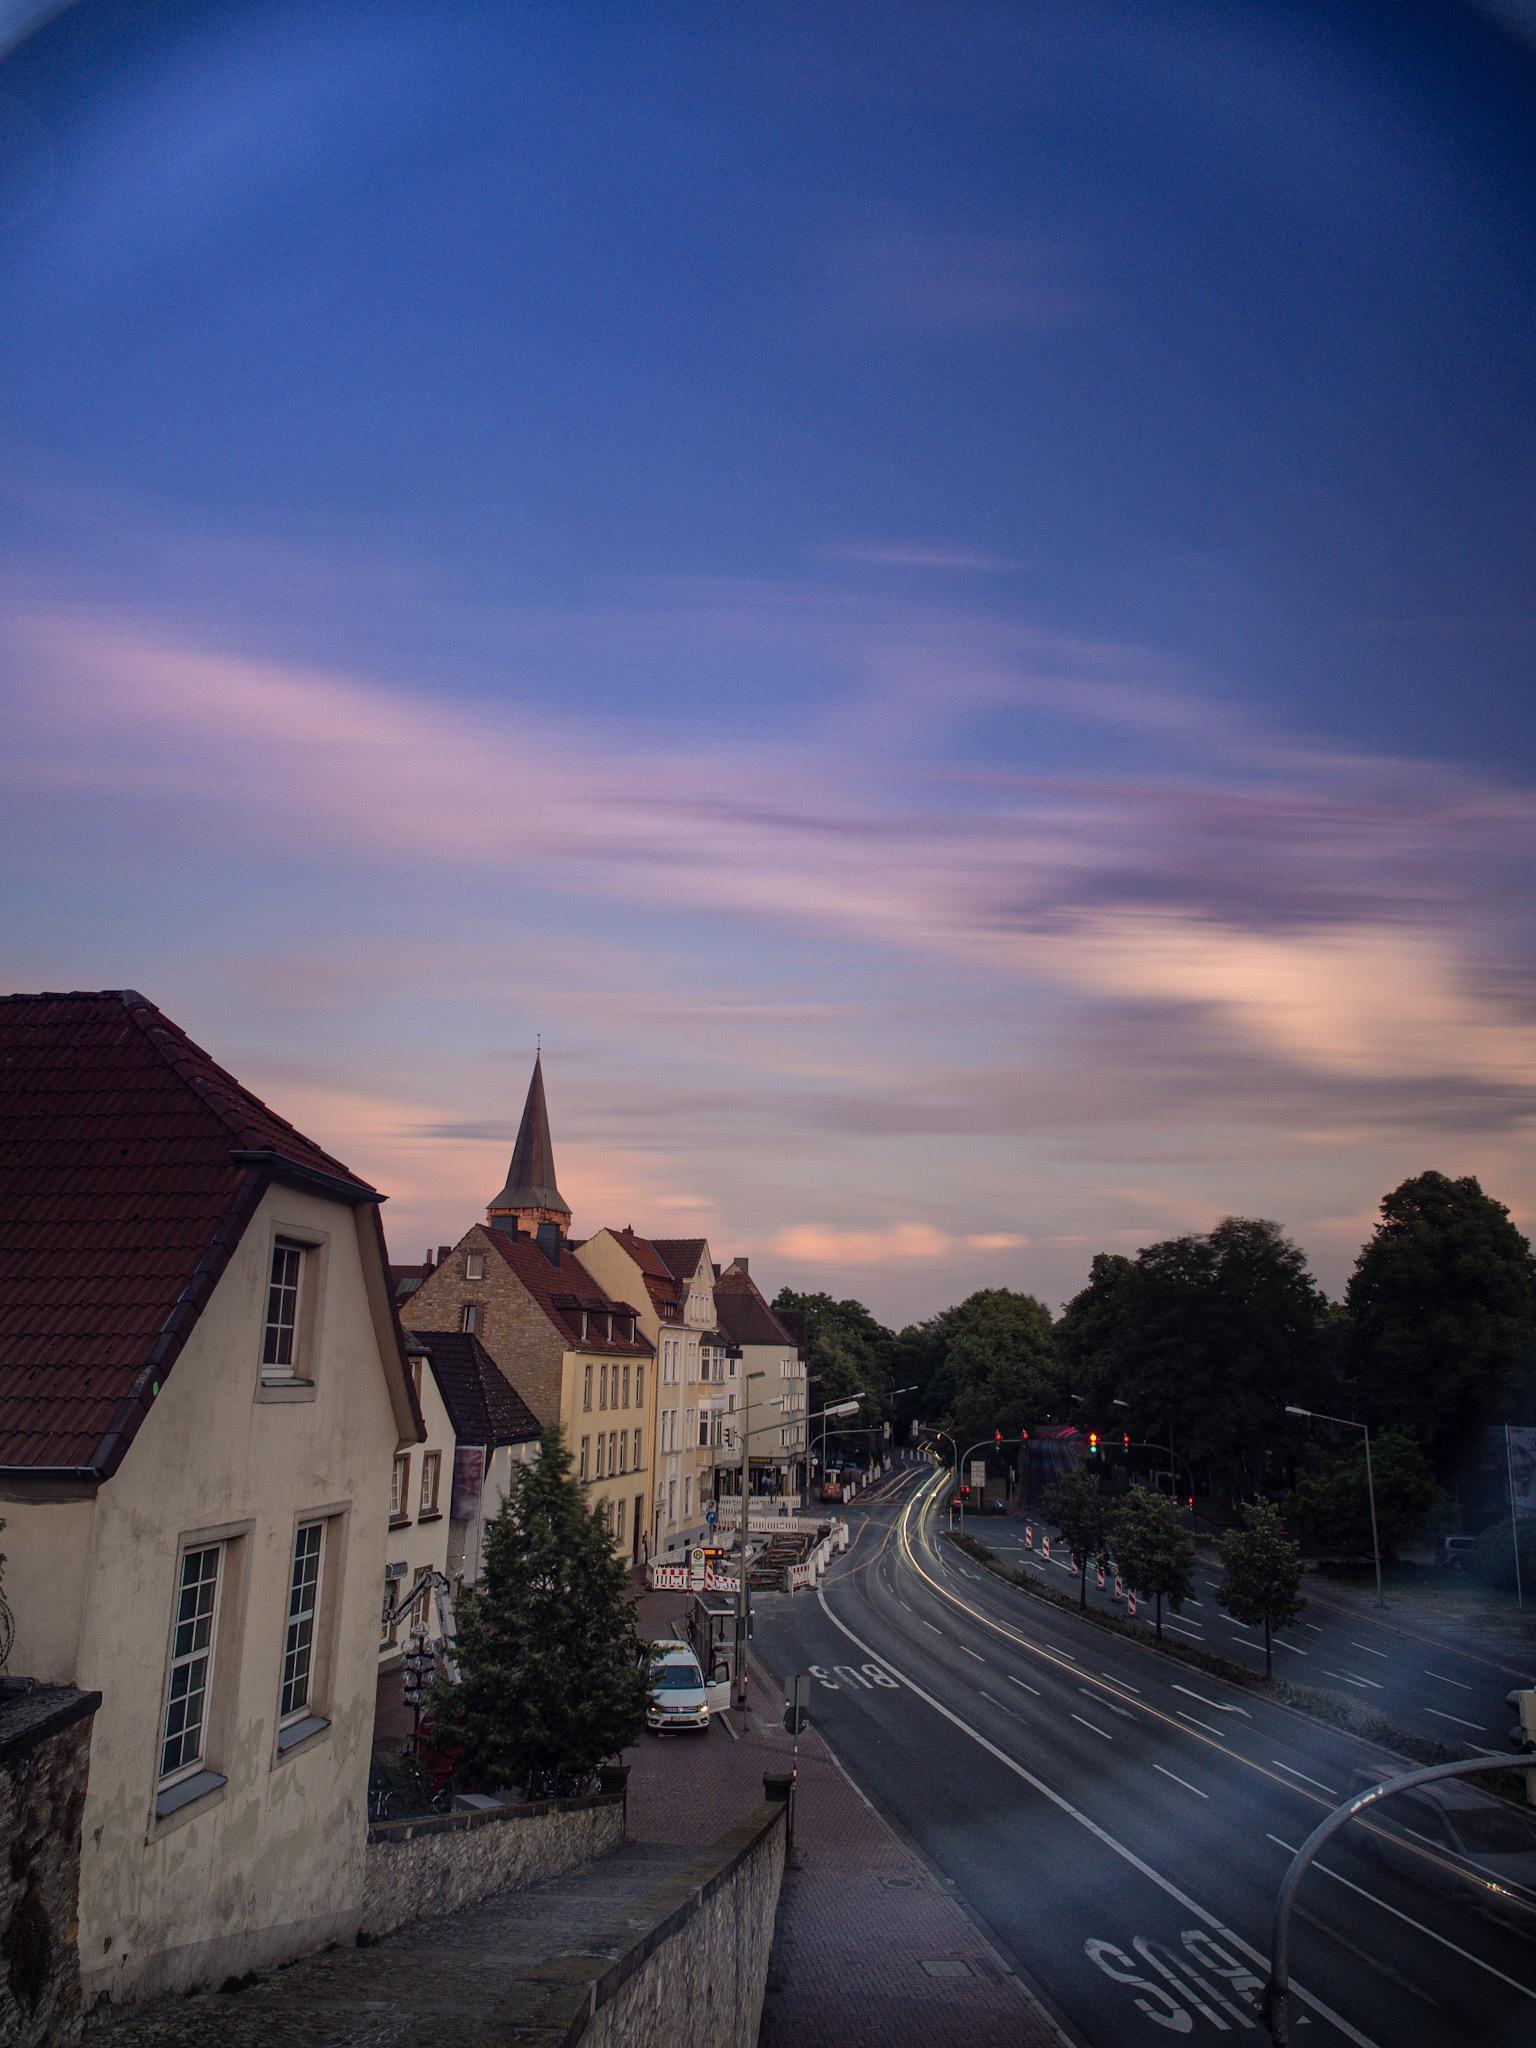 Osnabrück langzeitbelichtung nd filter olympus 12-40 pro m43 mft